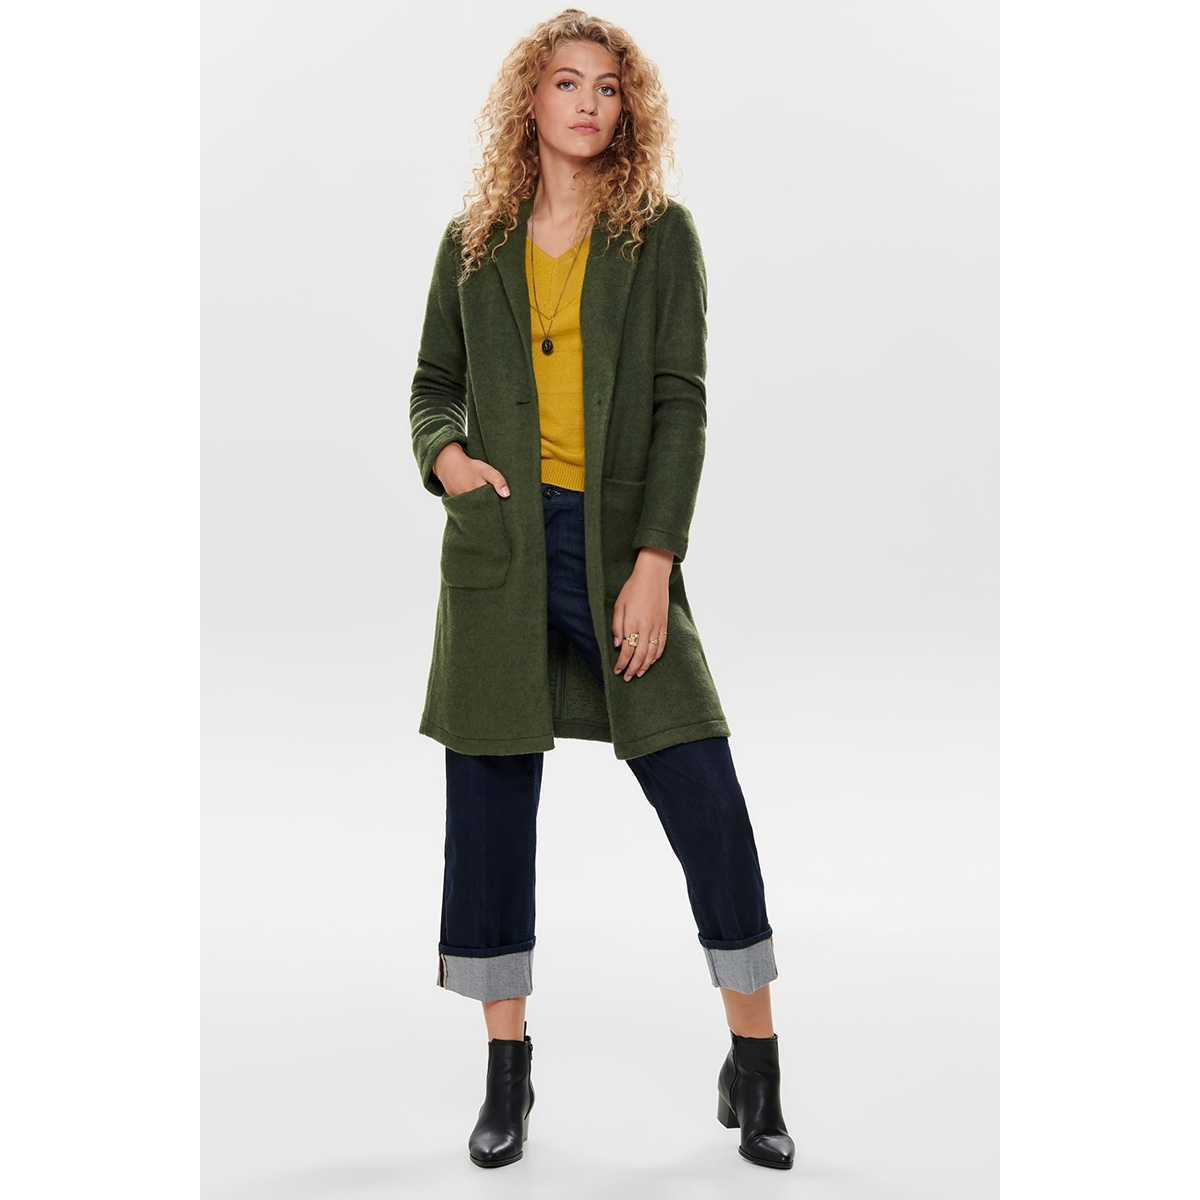 jdylela knit jacket otw gua 15184219 jacqueline de yong jas ivy green/black melange